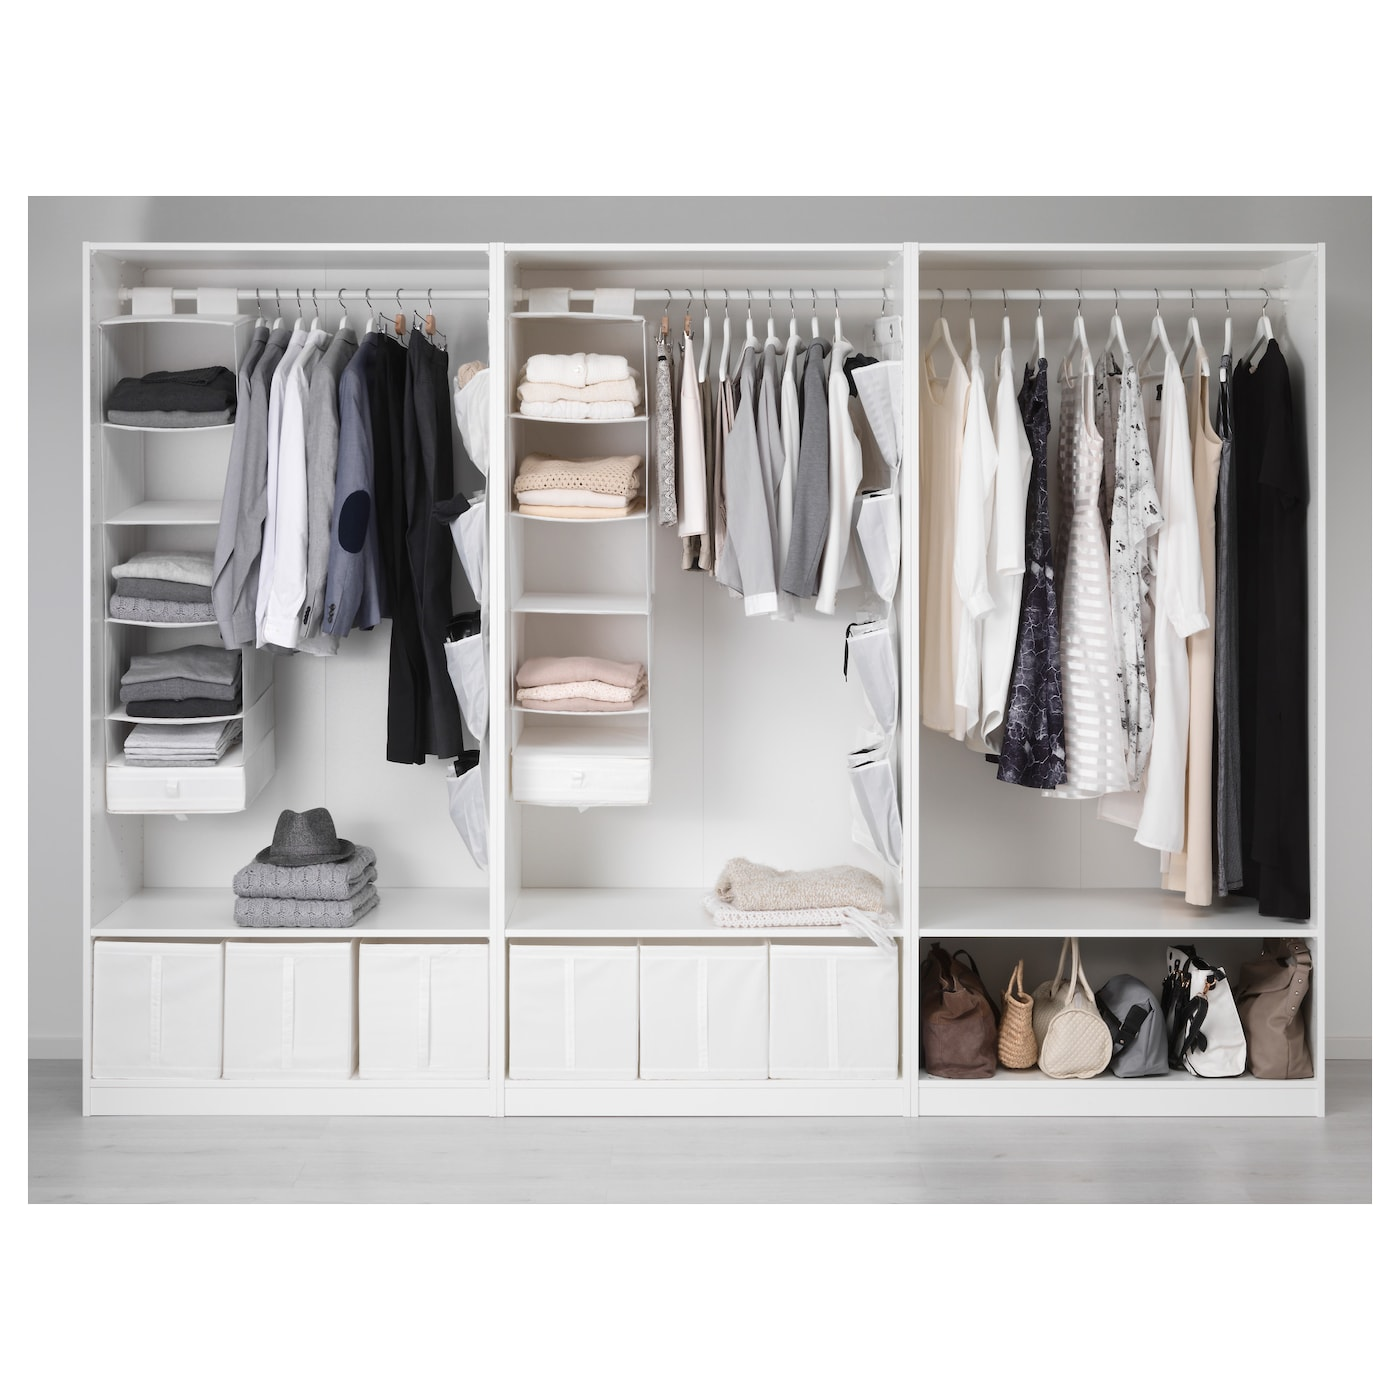 PAX Wardrobe Whitebergsbo Vikedal Xx Cm IKEA - Ikea wardrobe